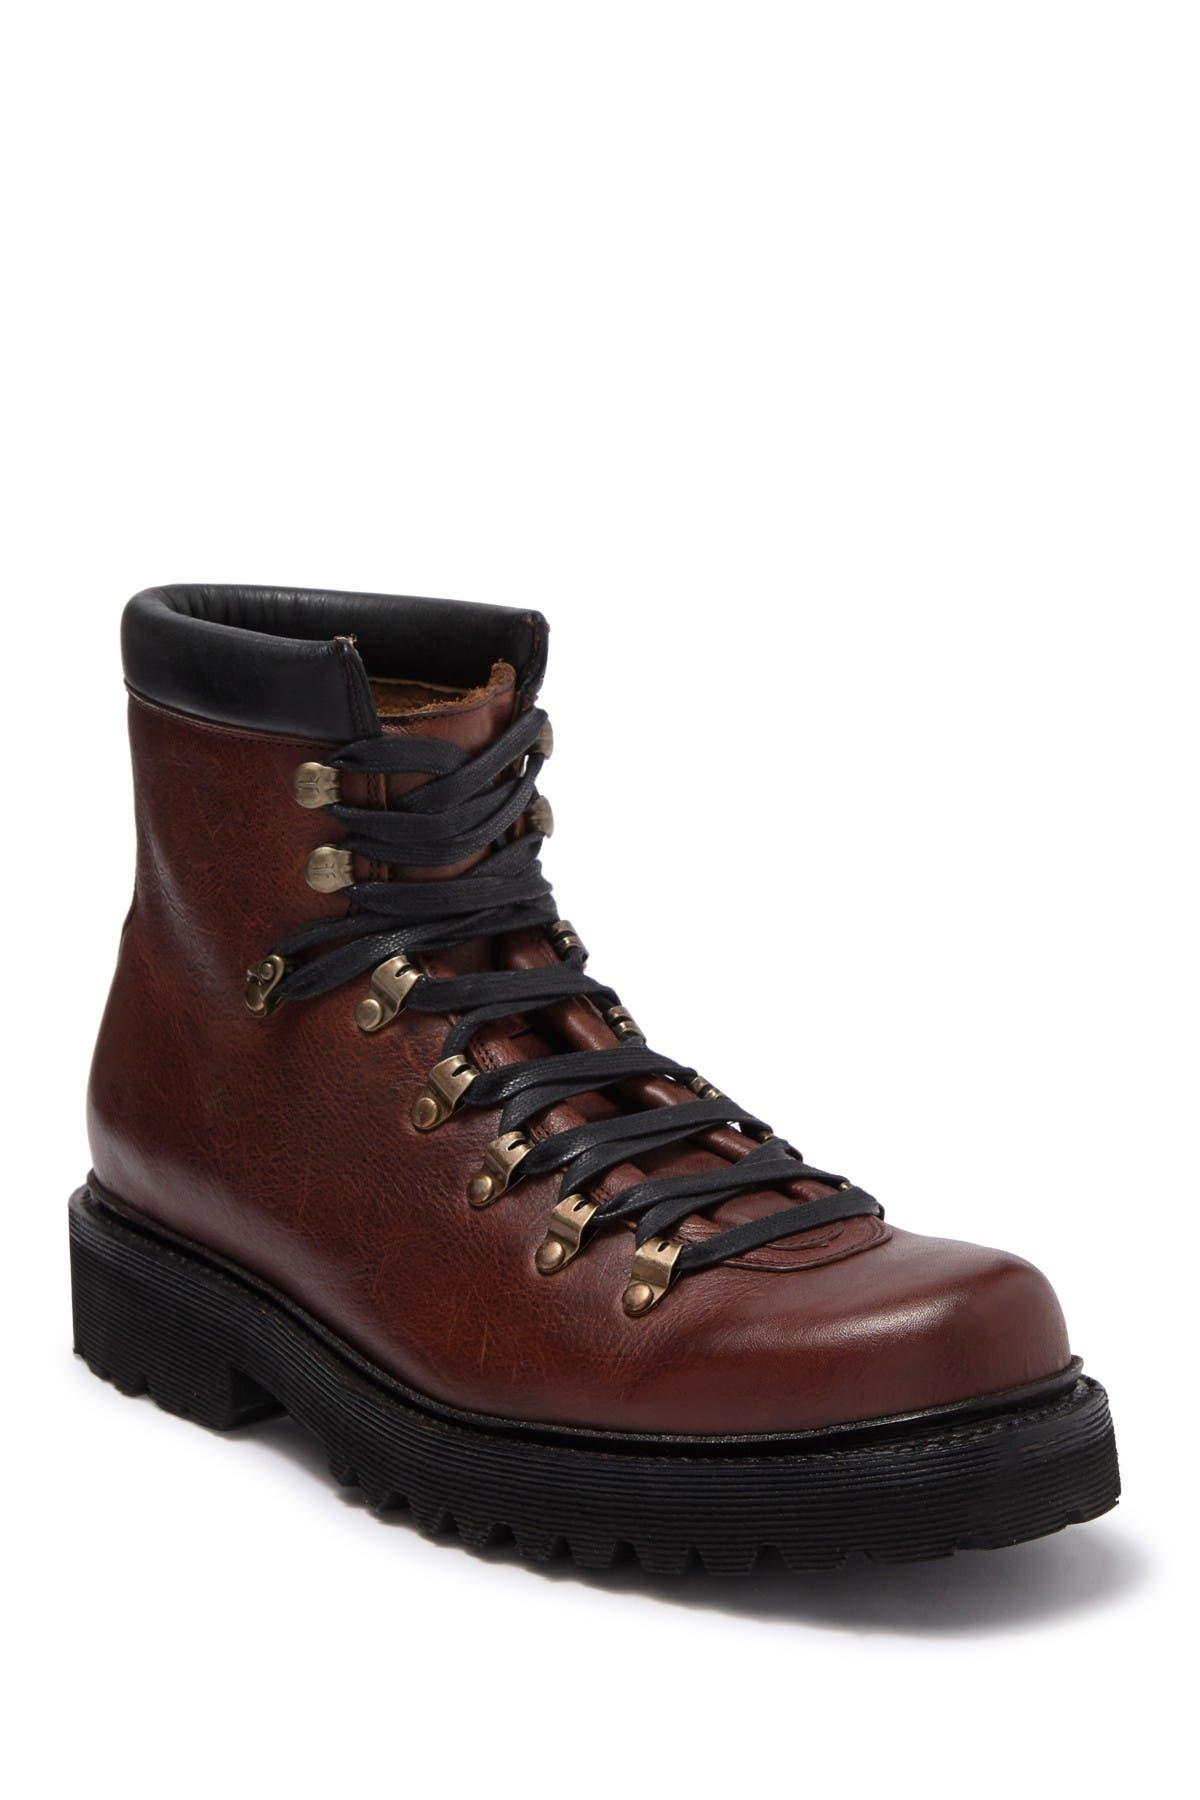 Frye | Woodson Leather Hiking Boot